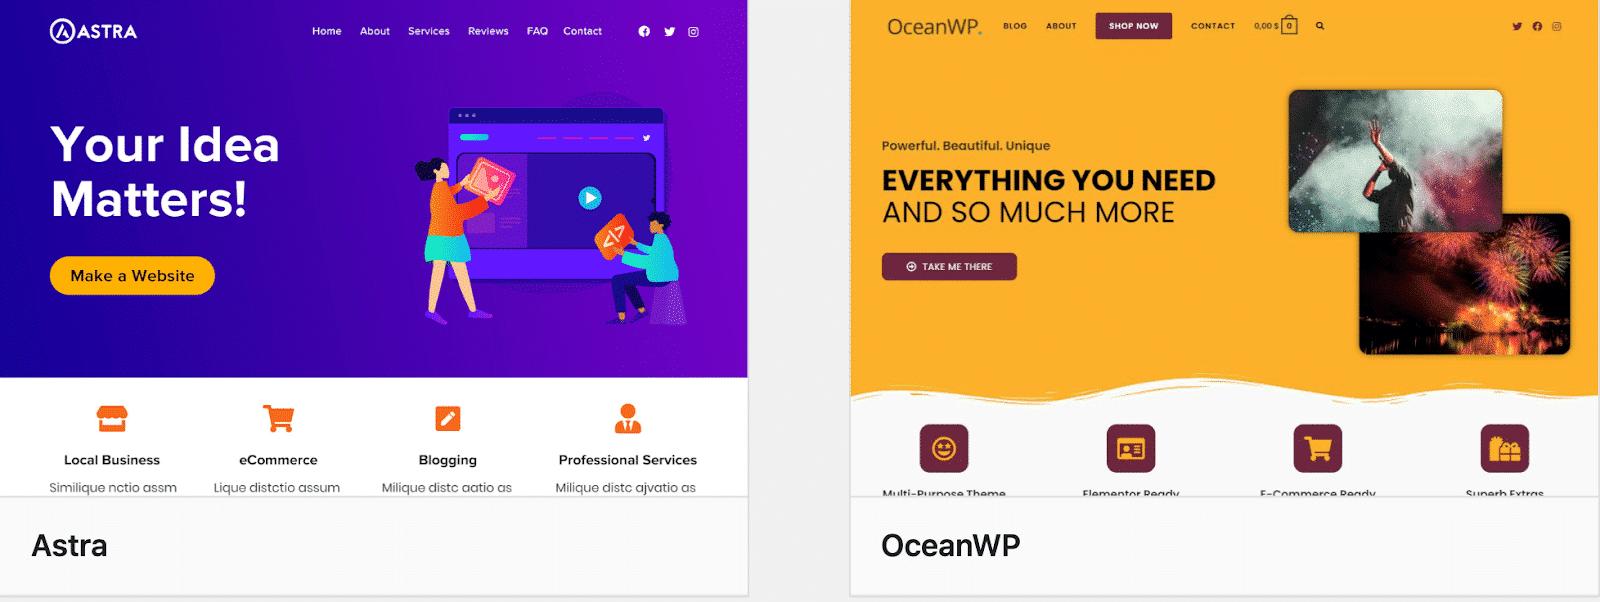 Astra vs OceanWP: performance comparison